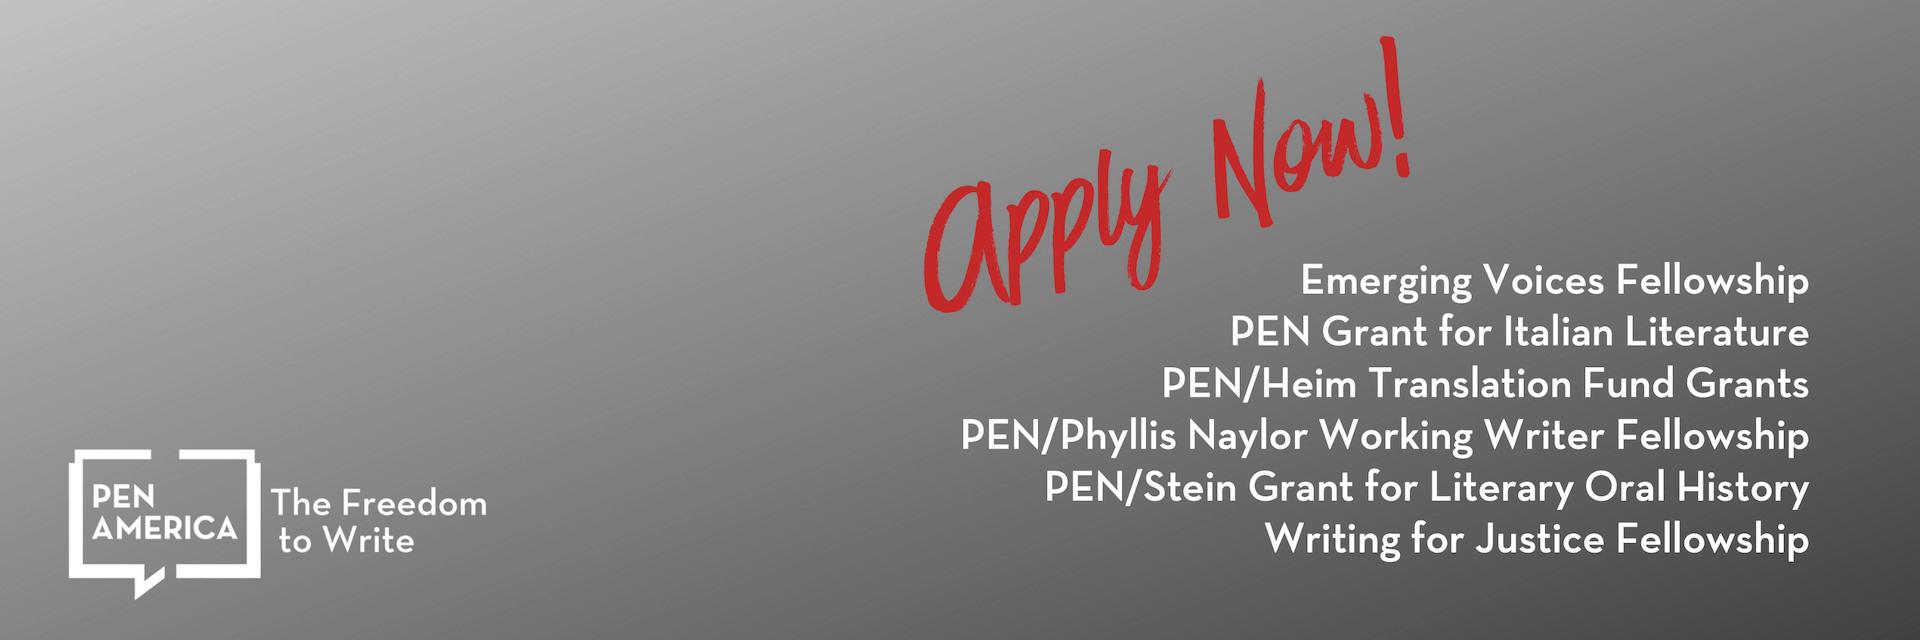 2019 Grants Fellowships Applications